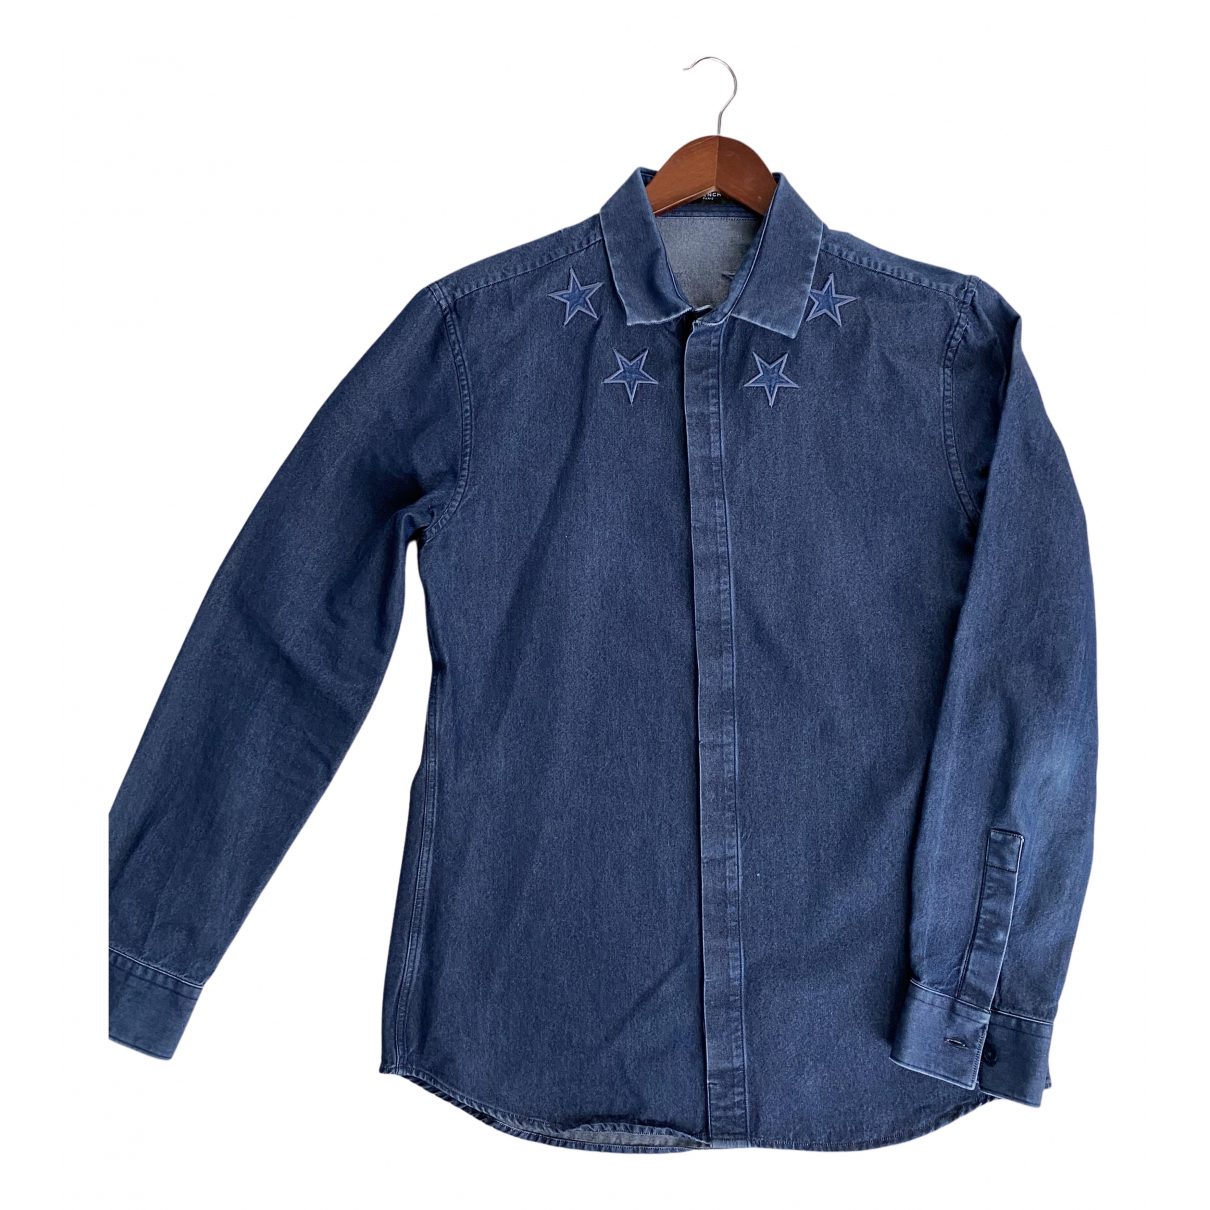 Givenchy N Blue Cotton Shirts for Men 41 EU (tour de cou / collar)